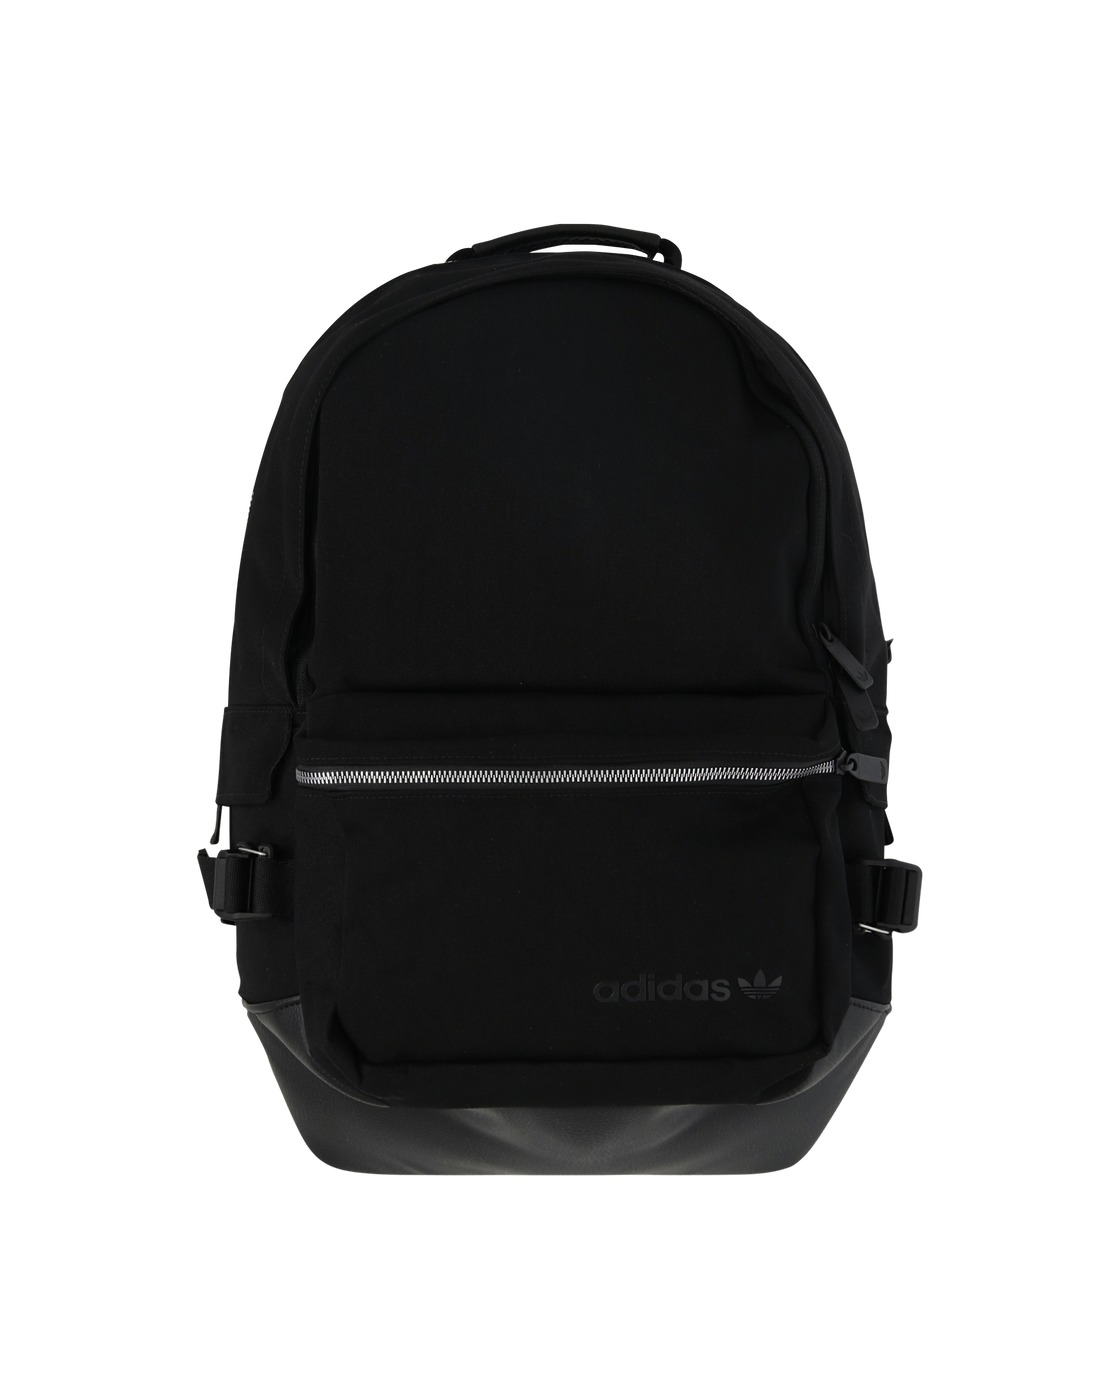 Adidas Originals Modern Backpack Black